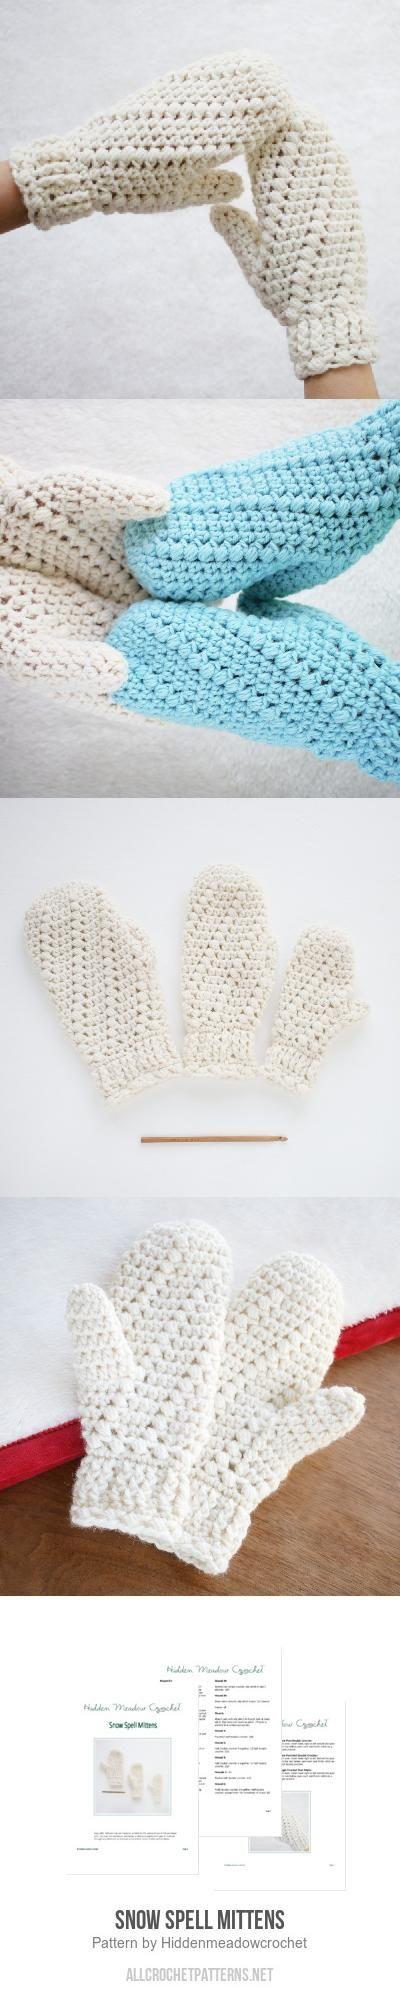 Mejores 118 imágenes de crochet gloves and mittens en Pinterest ...